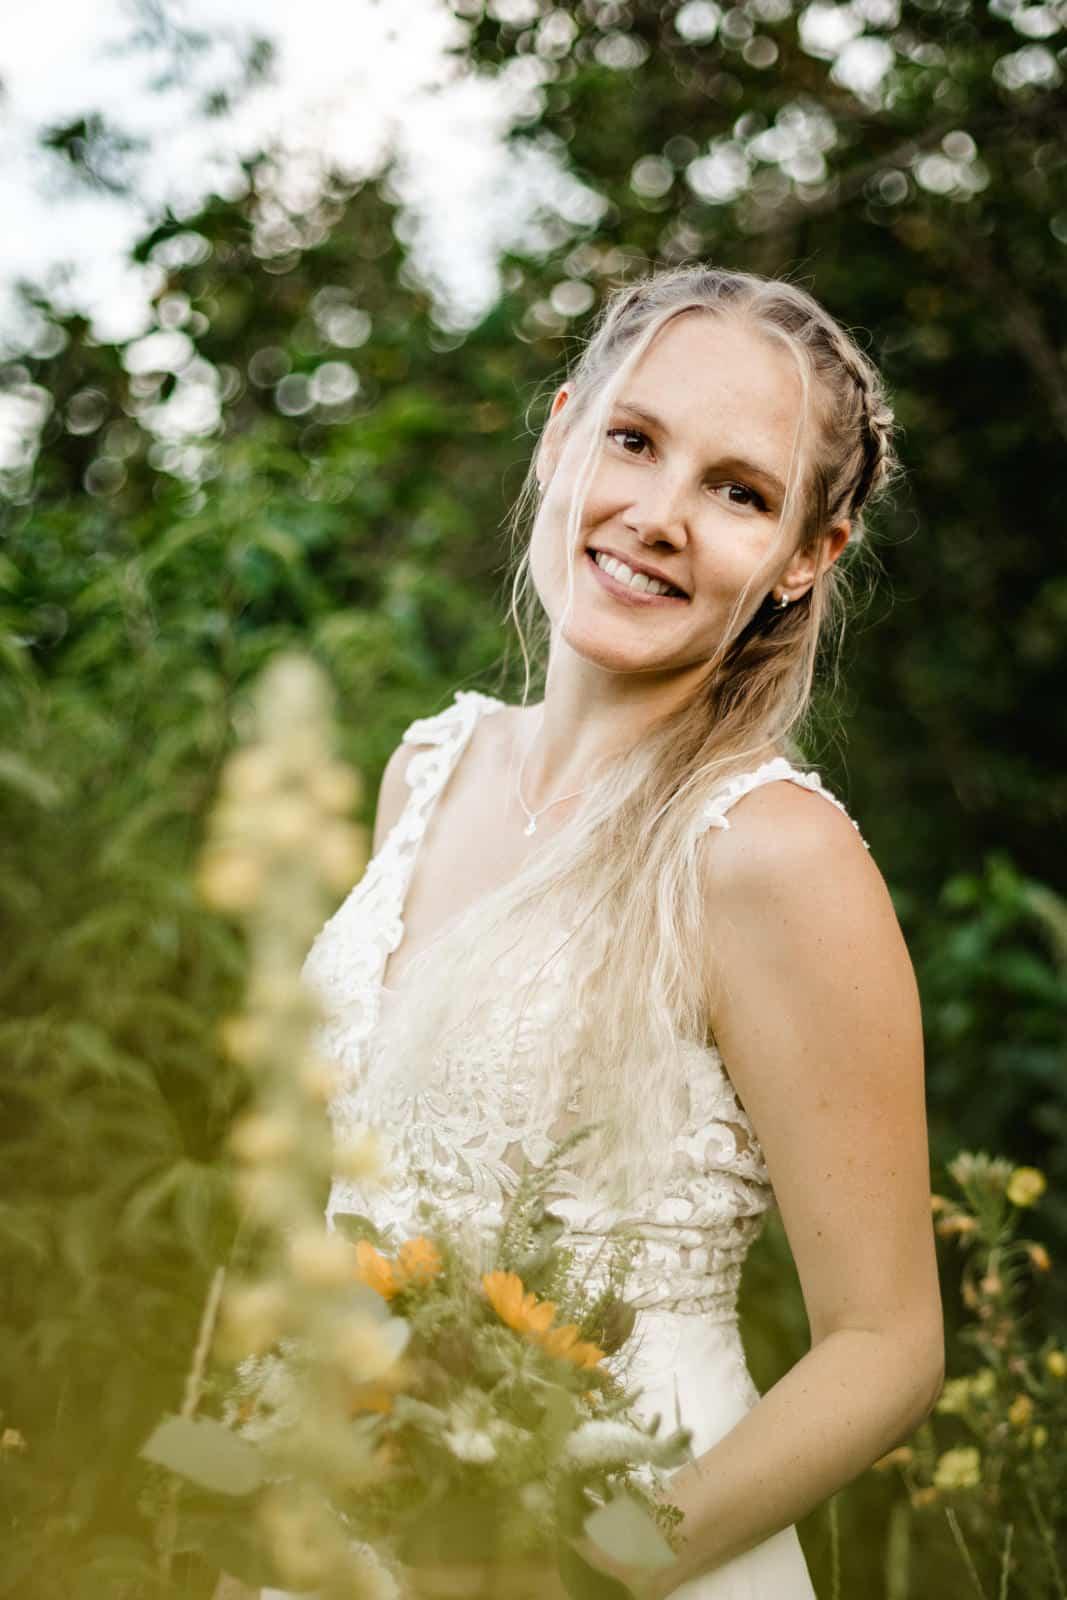 Braut lacht in Kamera beim Fotoshooting in den Griesheimer Dünen